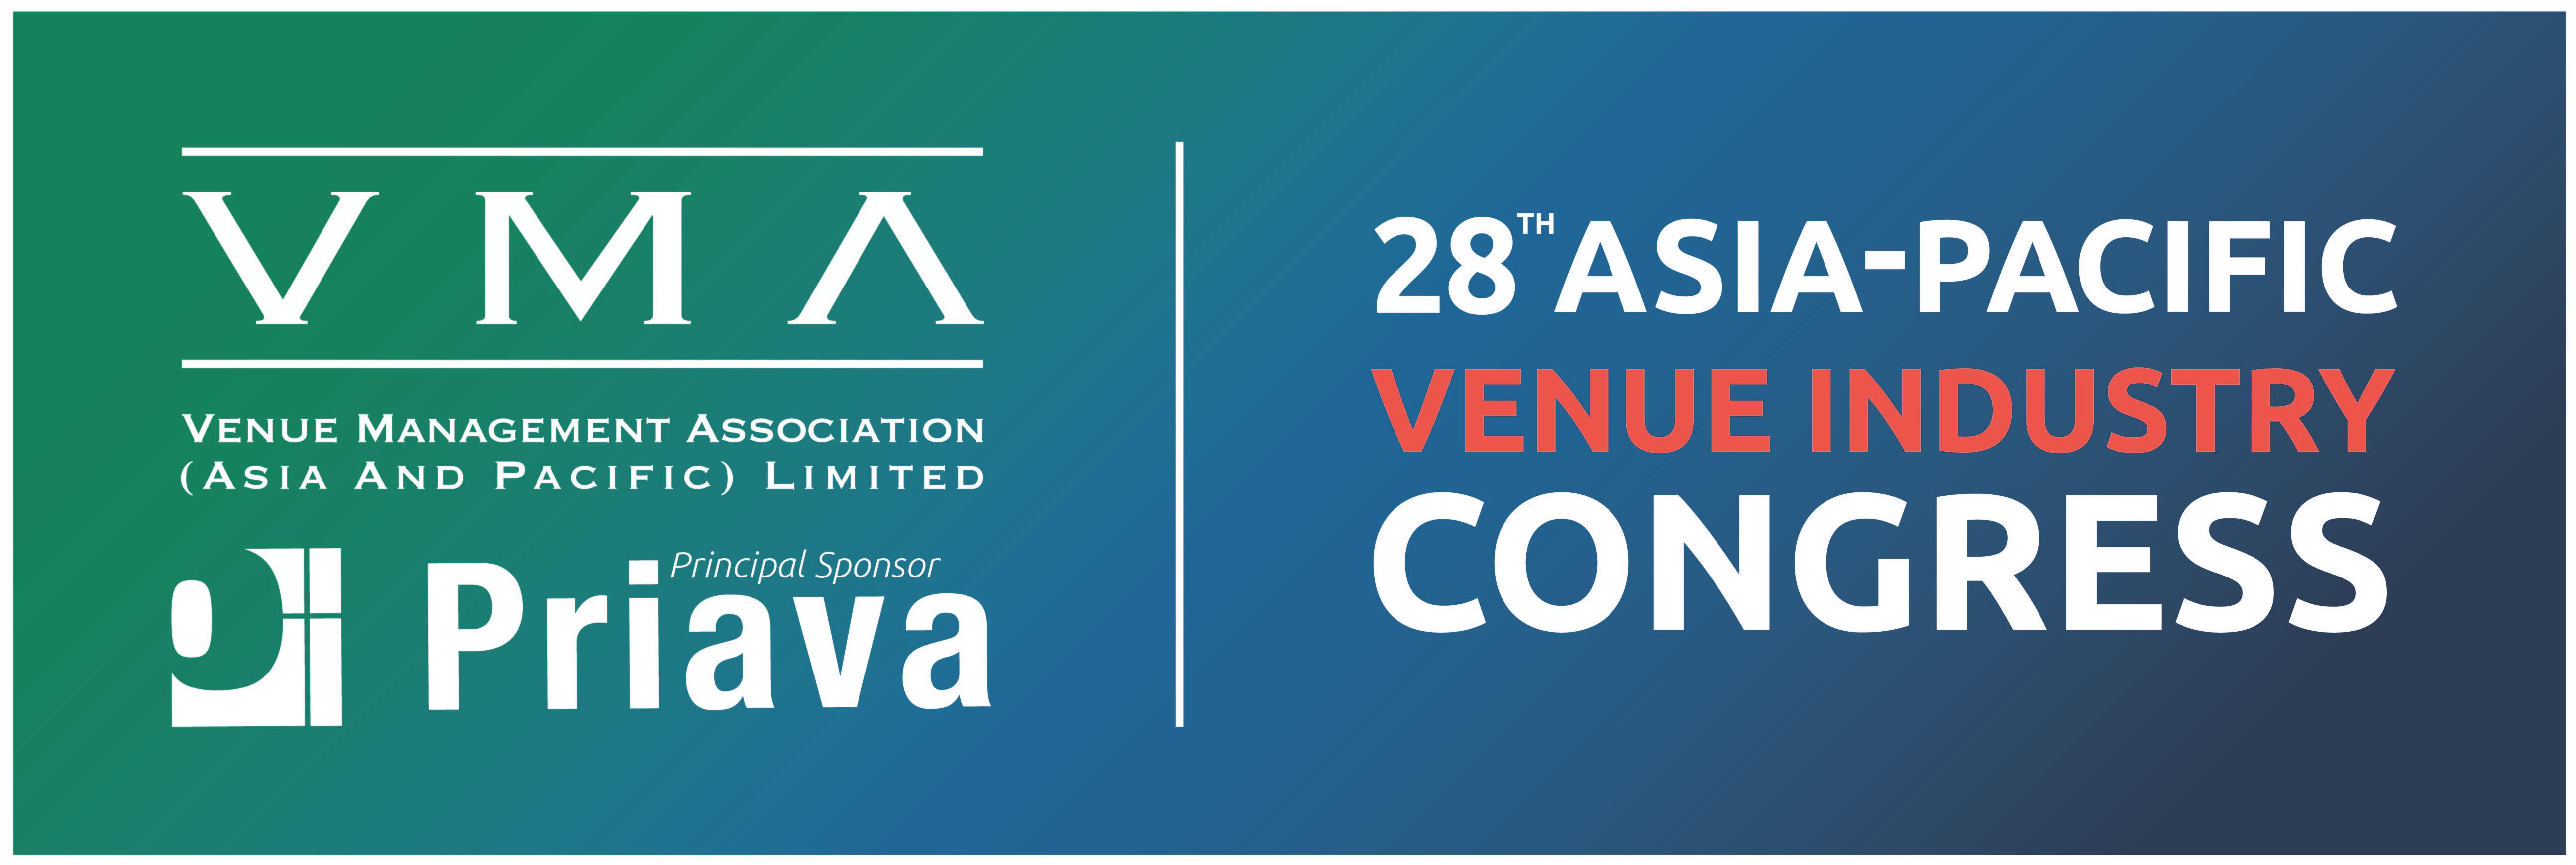 Asia-Pacific Venue Industry Congress